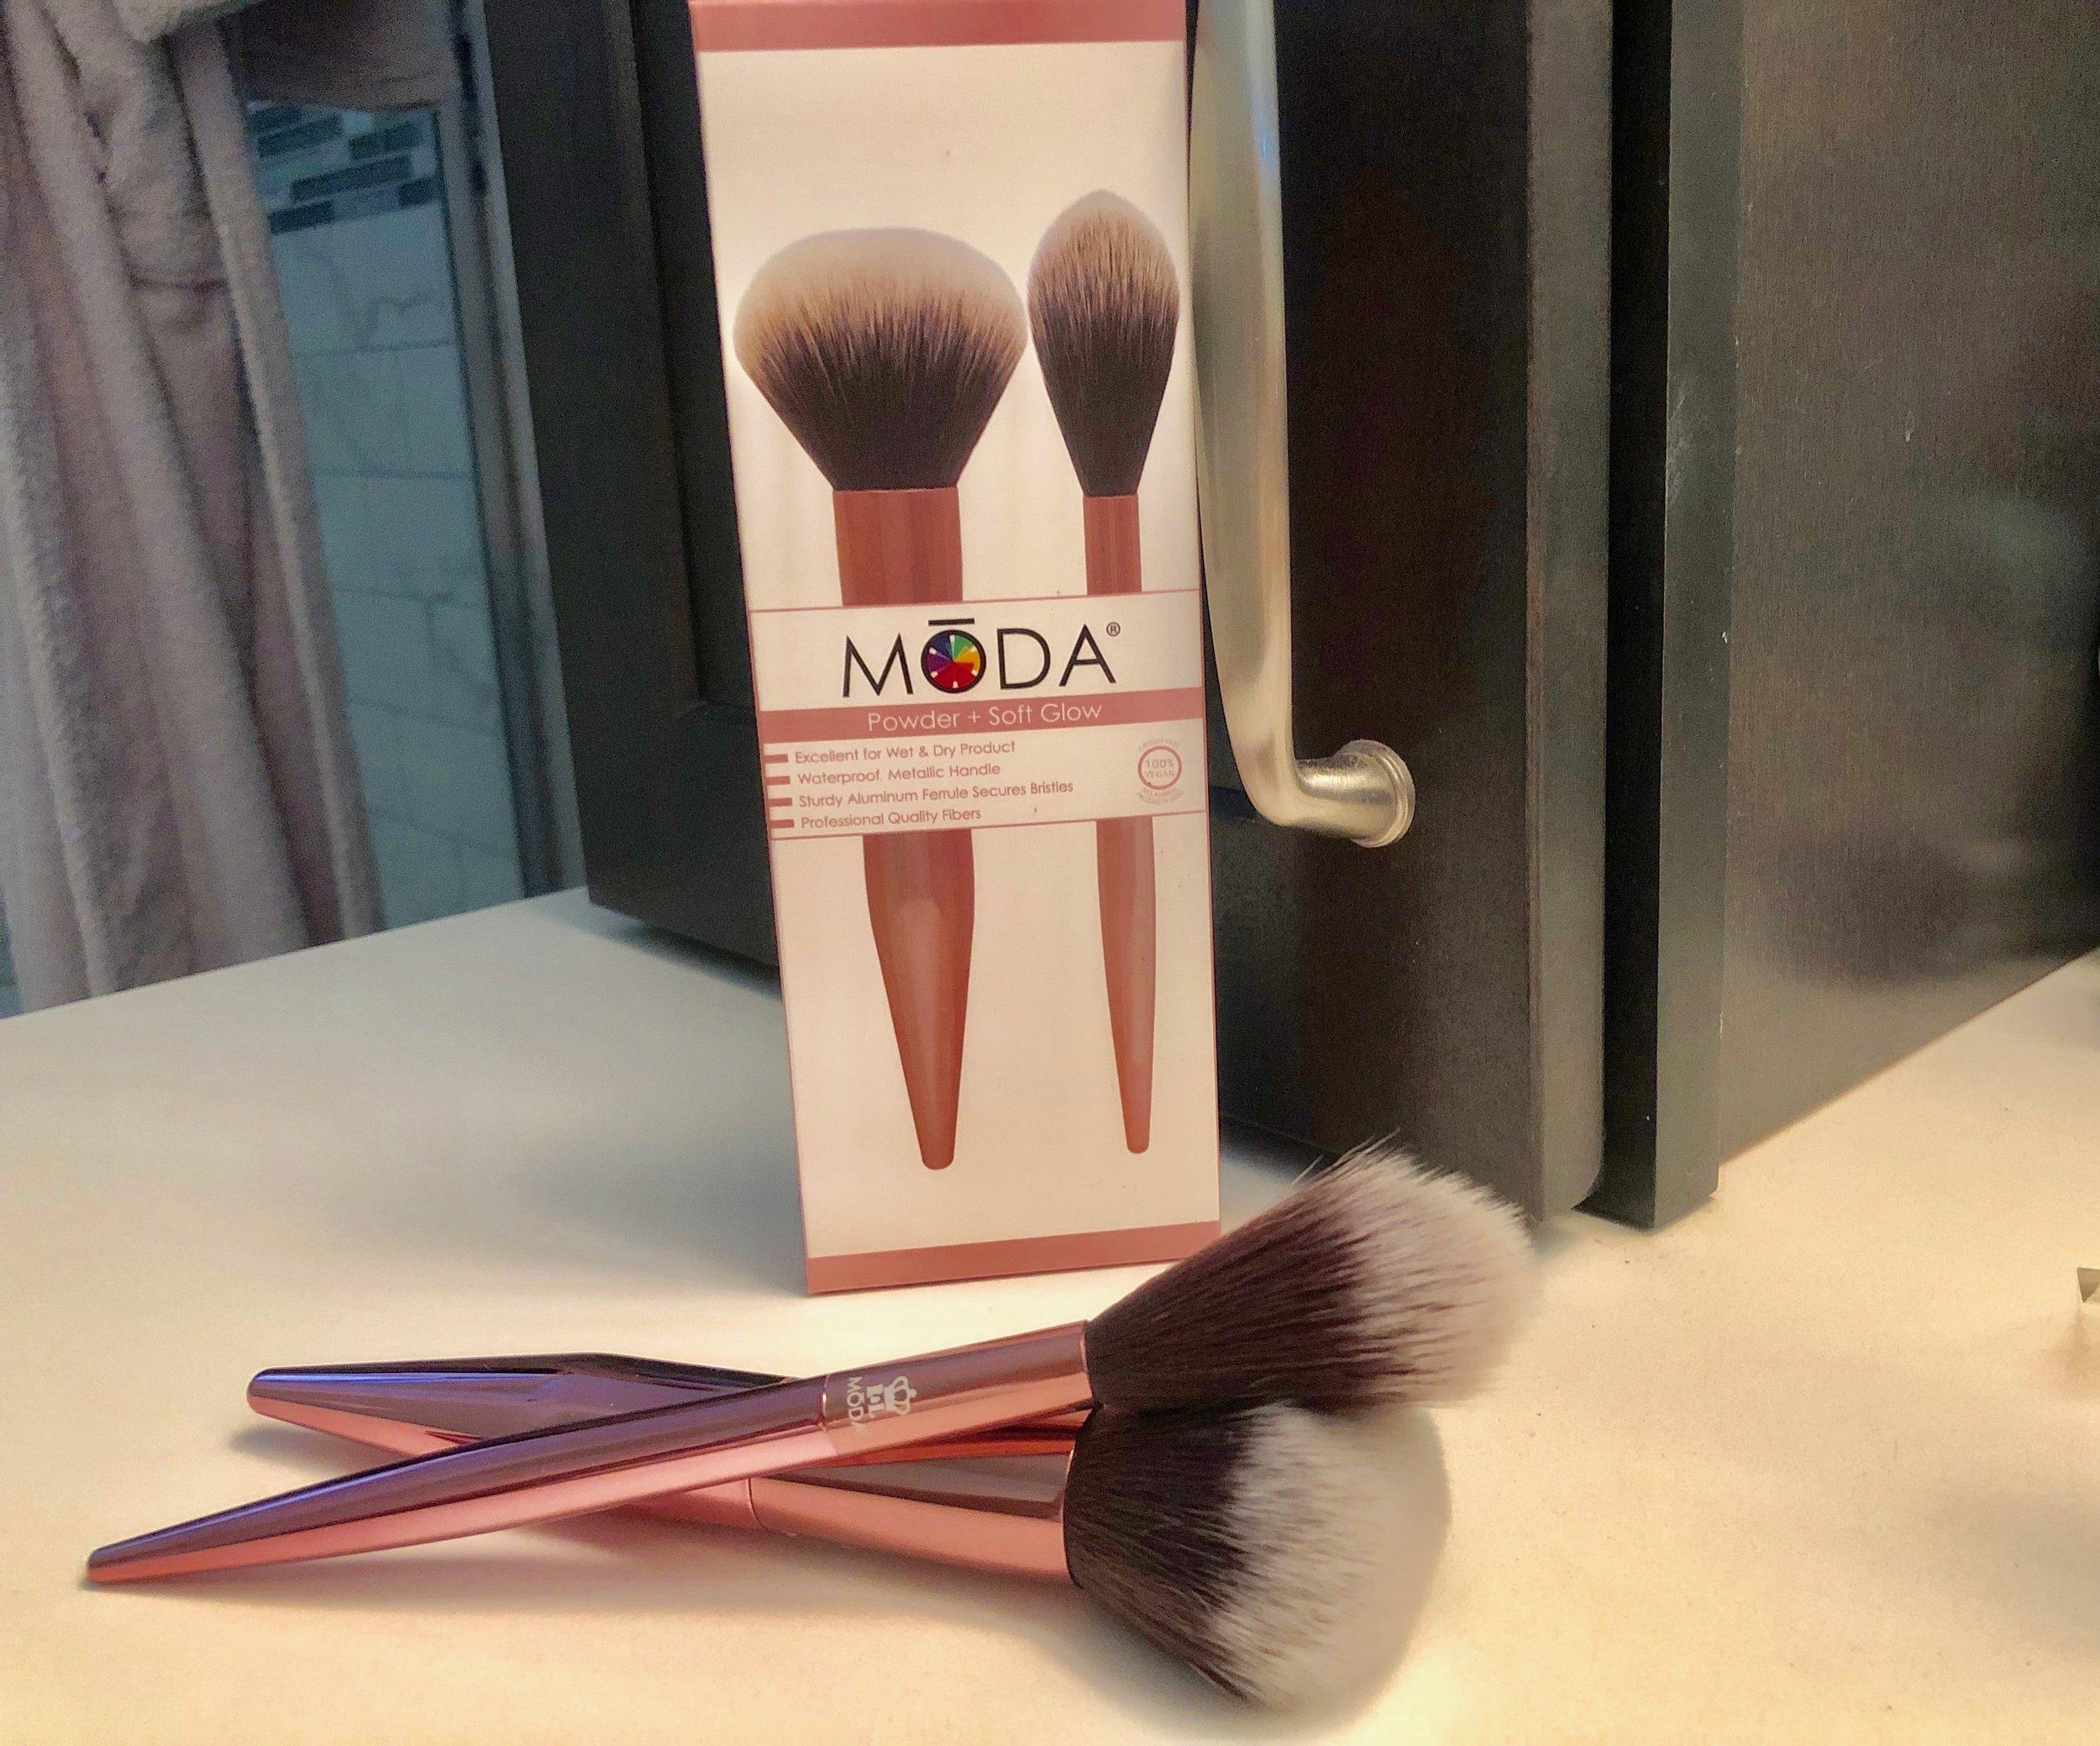 moda_brush.jpg